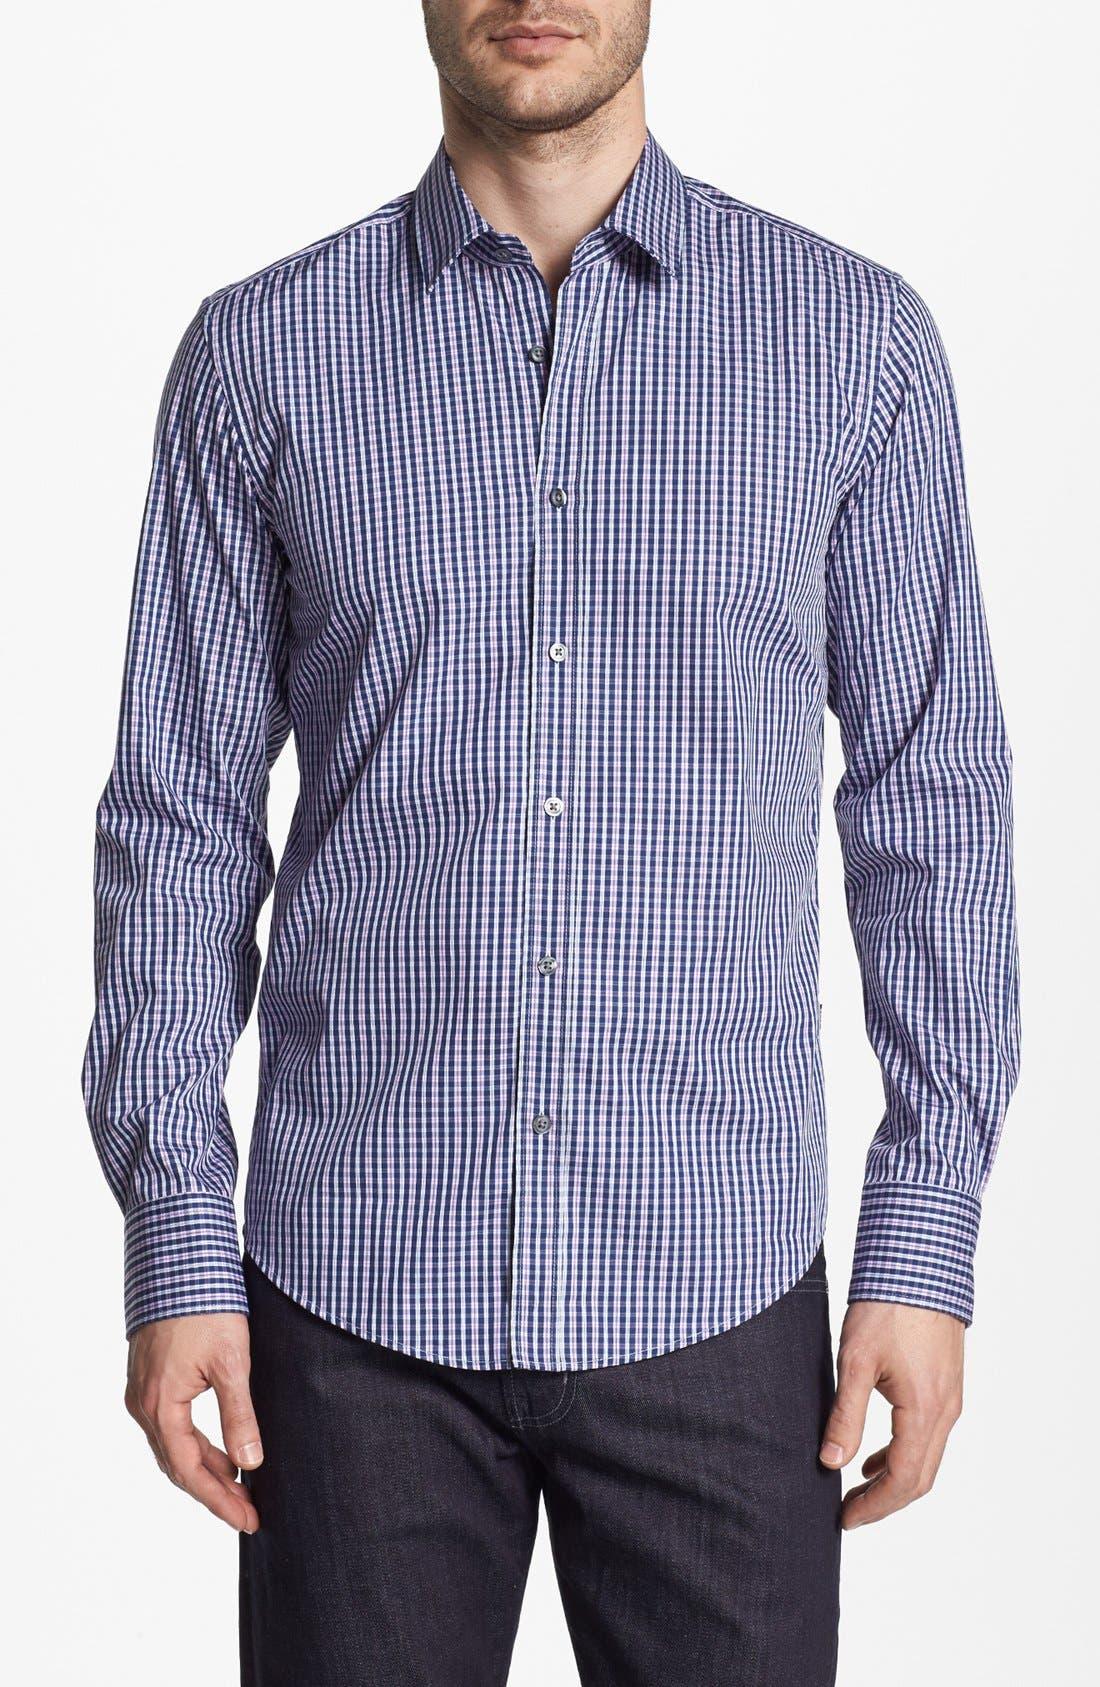 Main Image - BOSS HUGO BOSS 'Ronny' Slim Fit Sport Shirt